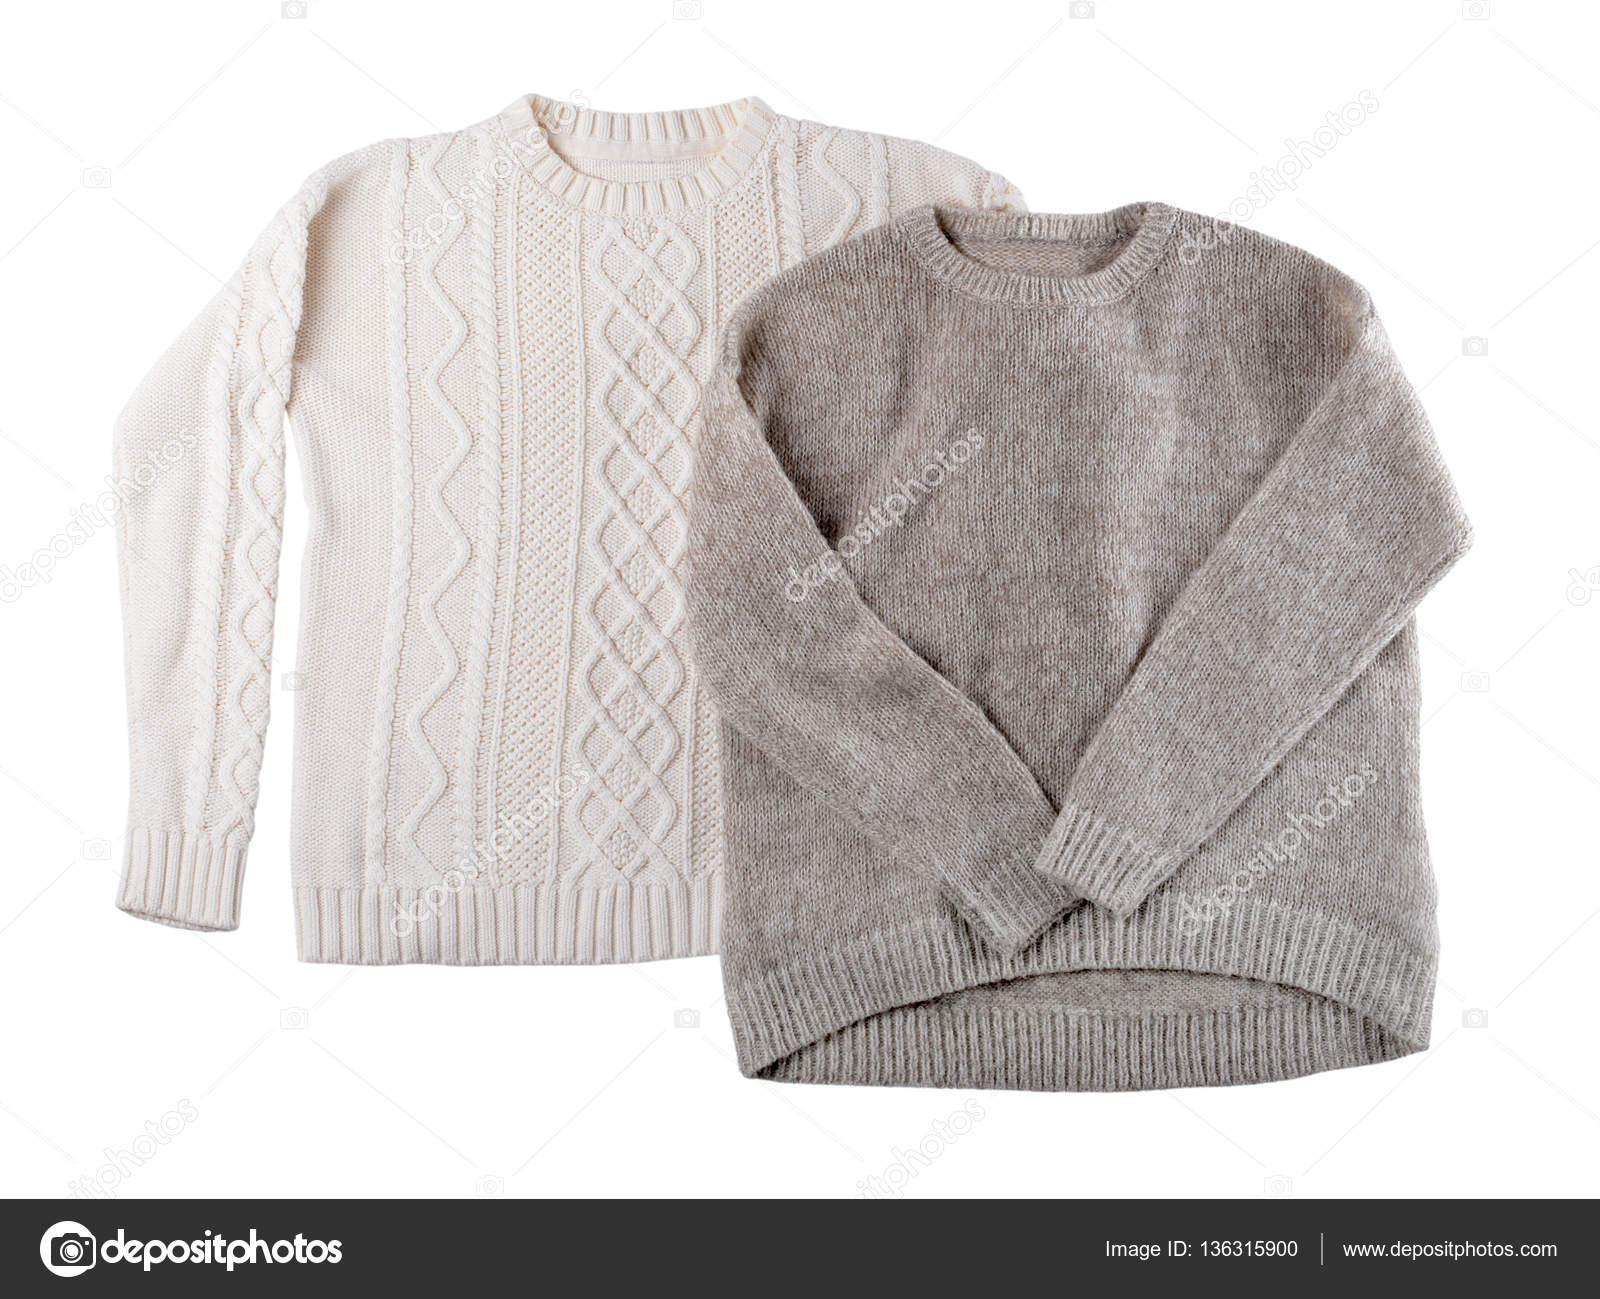 98ef4eab58b9 Ζεστά πλεκτά πουλόβερ — Φωτογραφία Αρχείου © belchonock  136315900